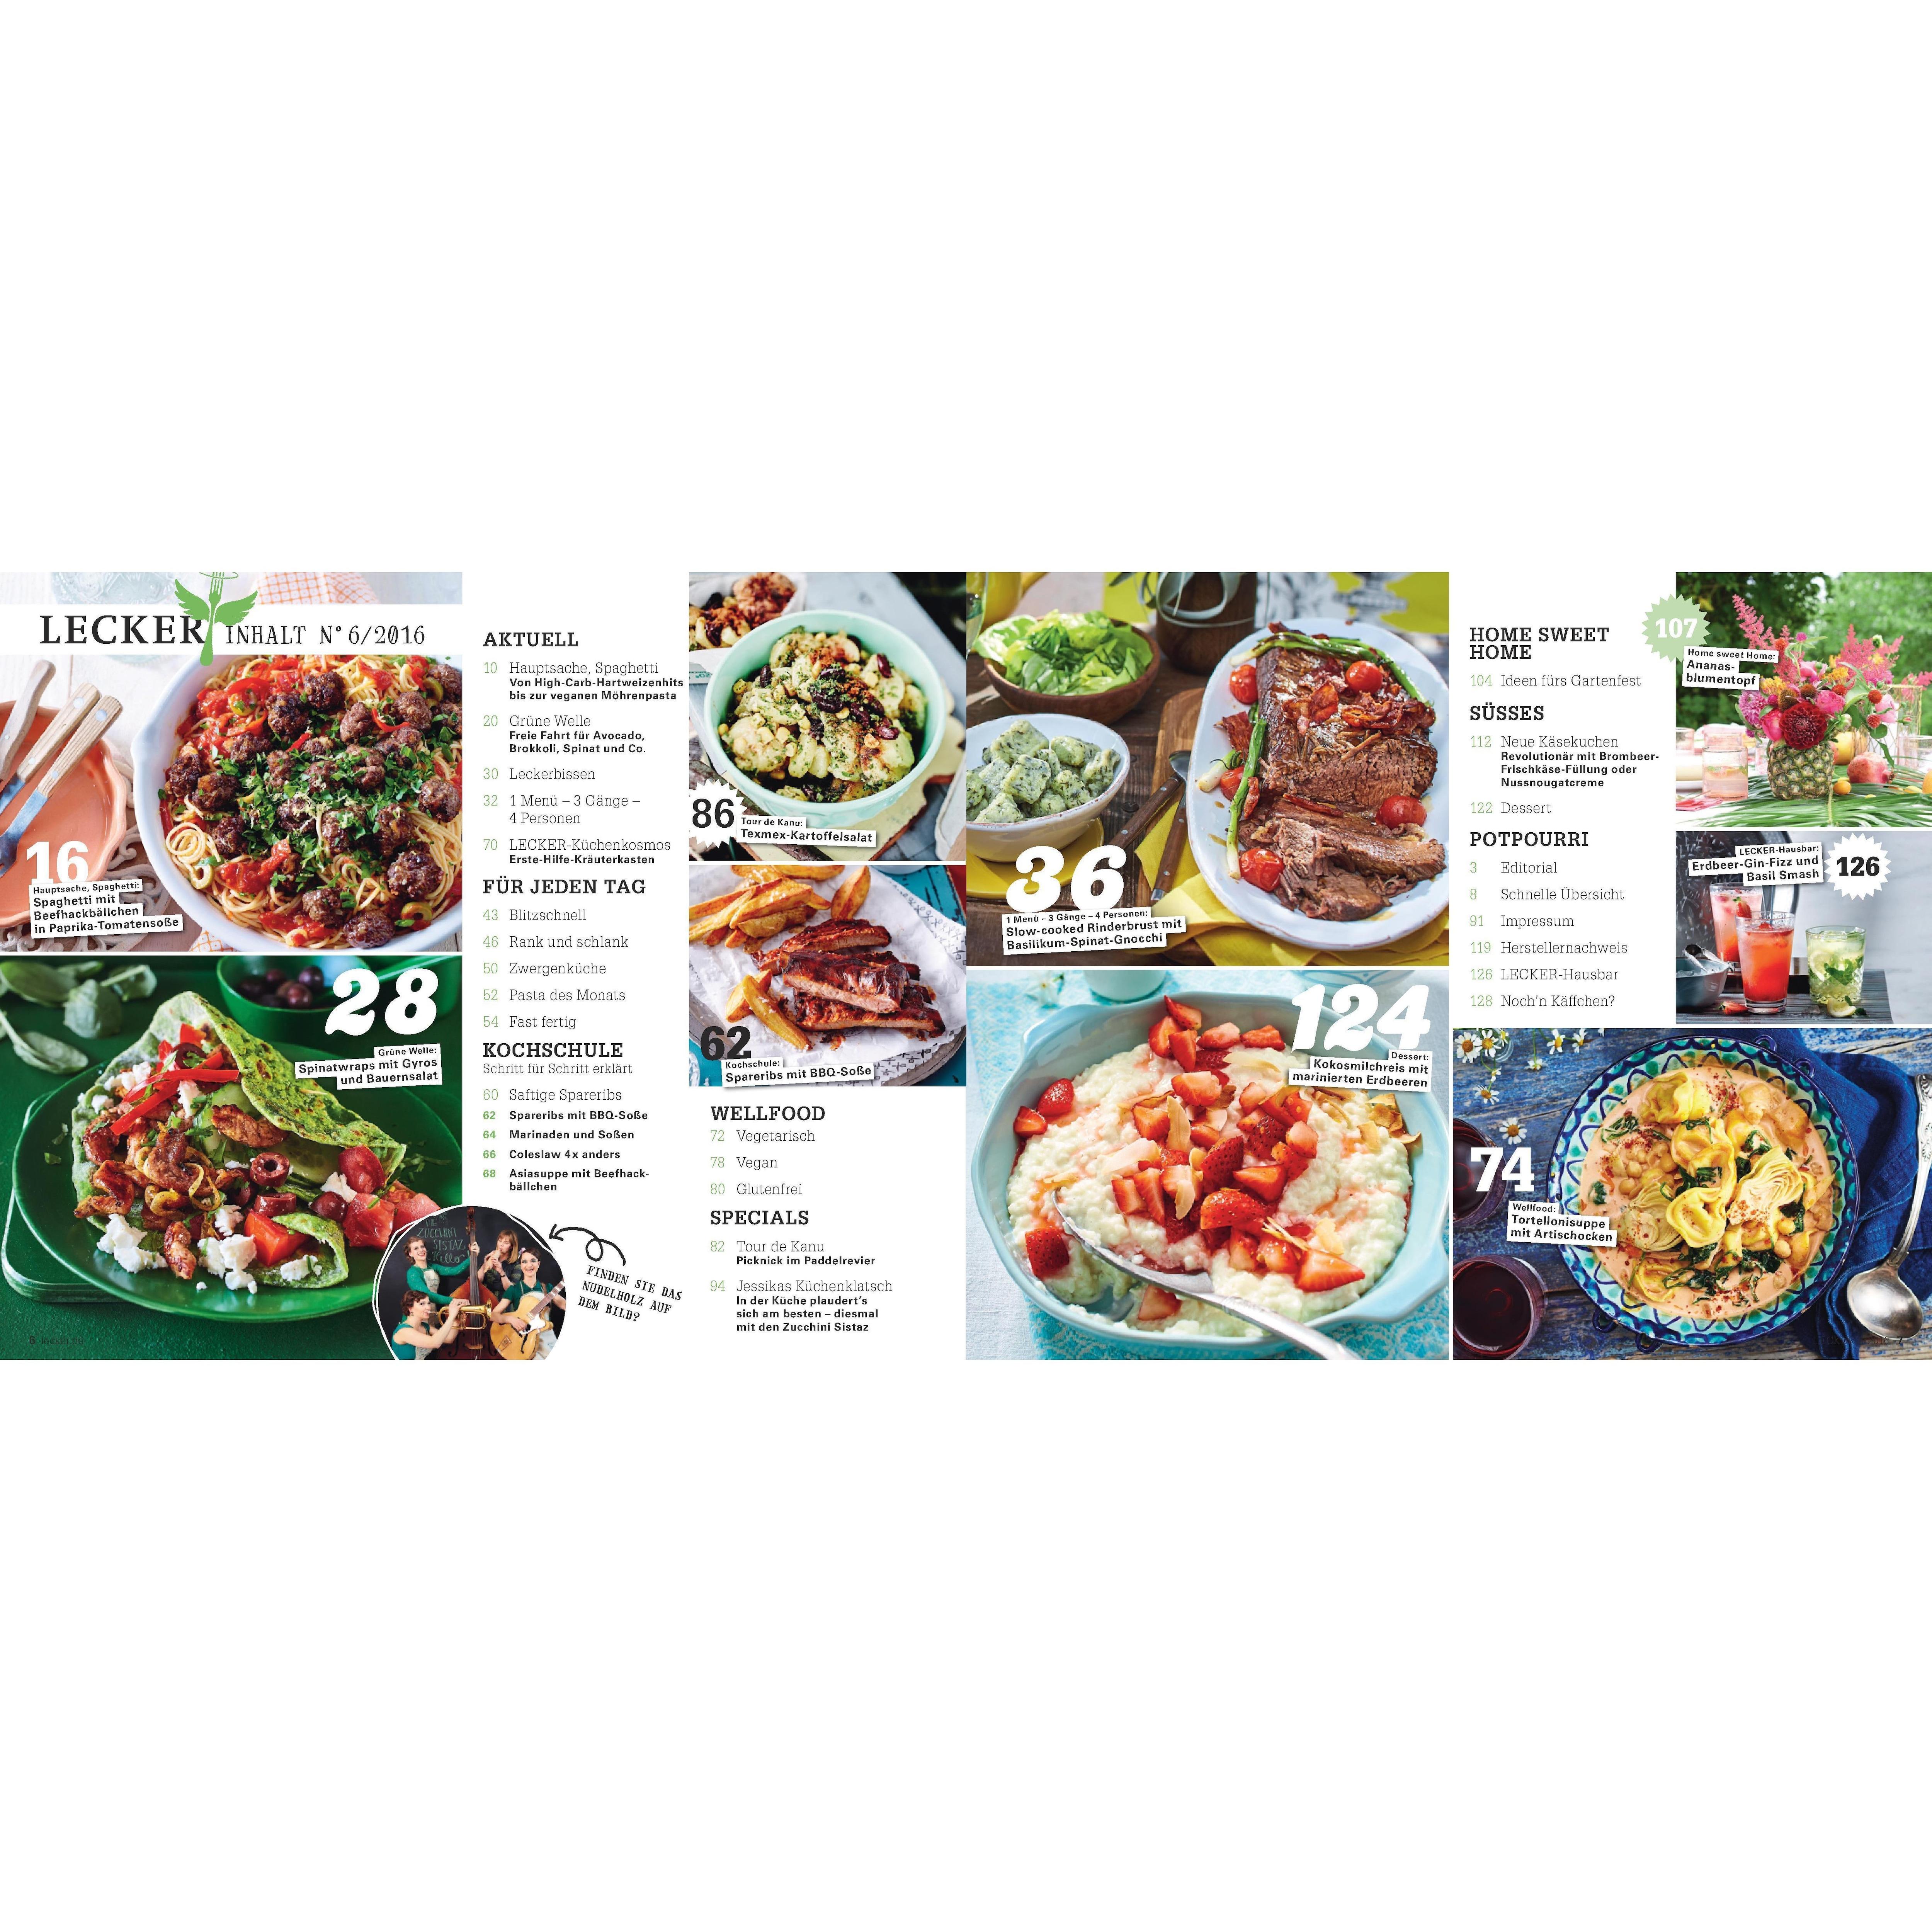 LECKER 6/2016 30-Minuten Sommerküche bei REWE online bestellen!